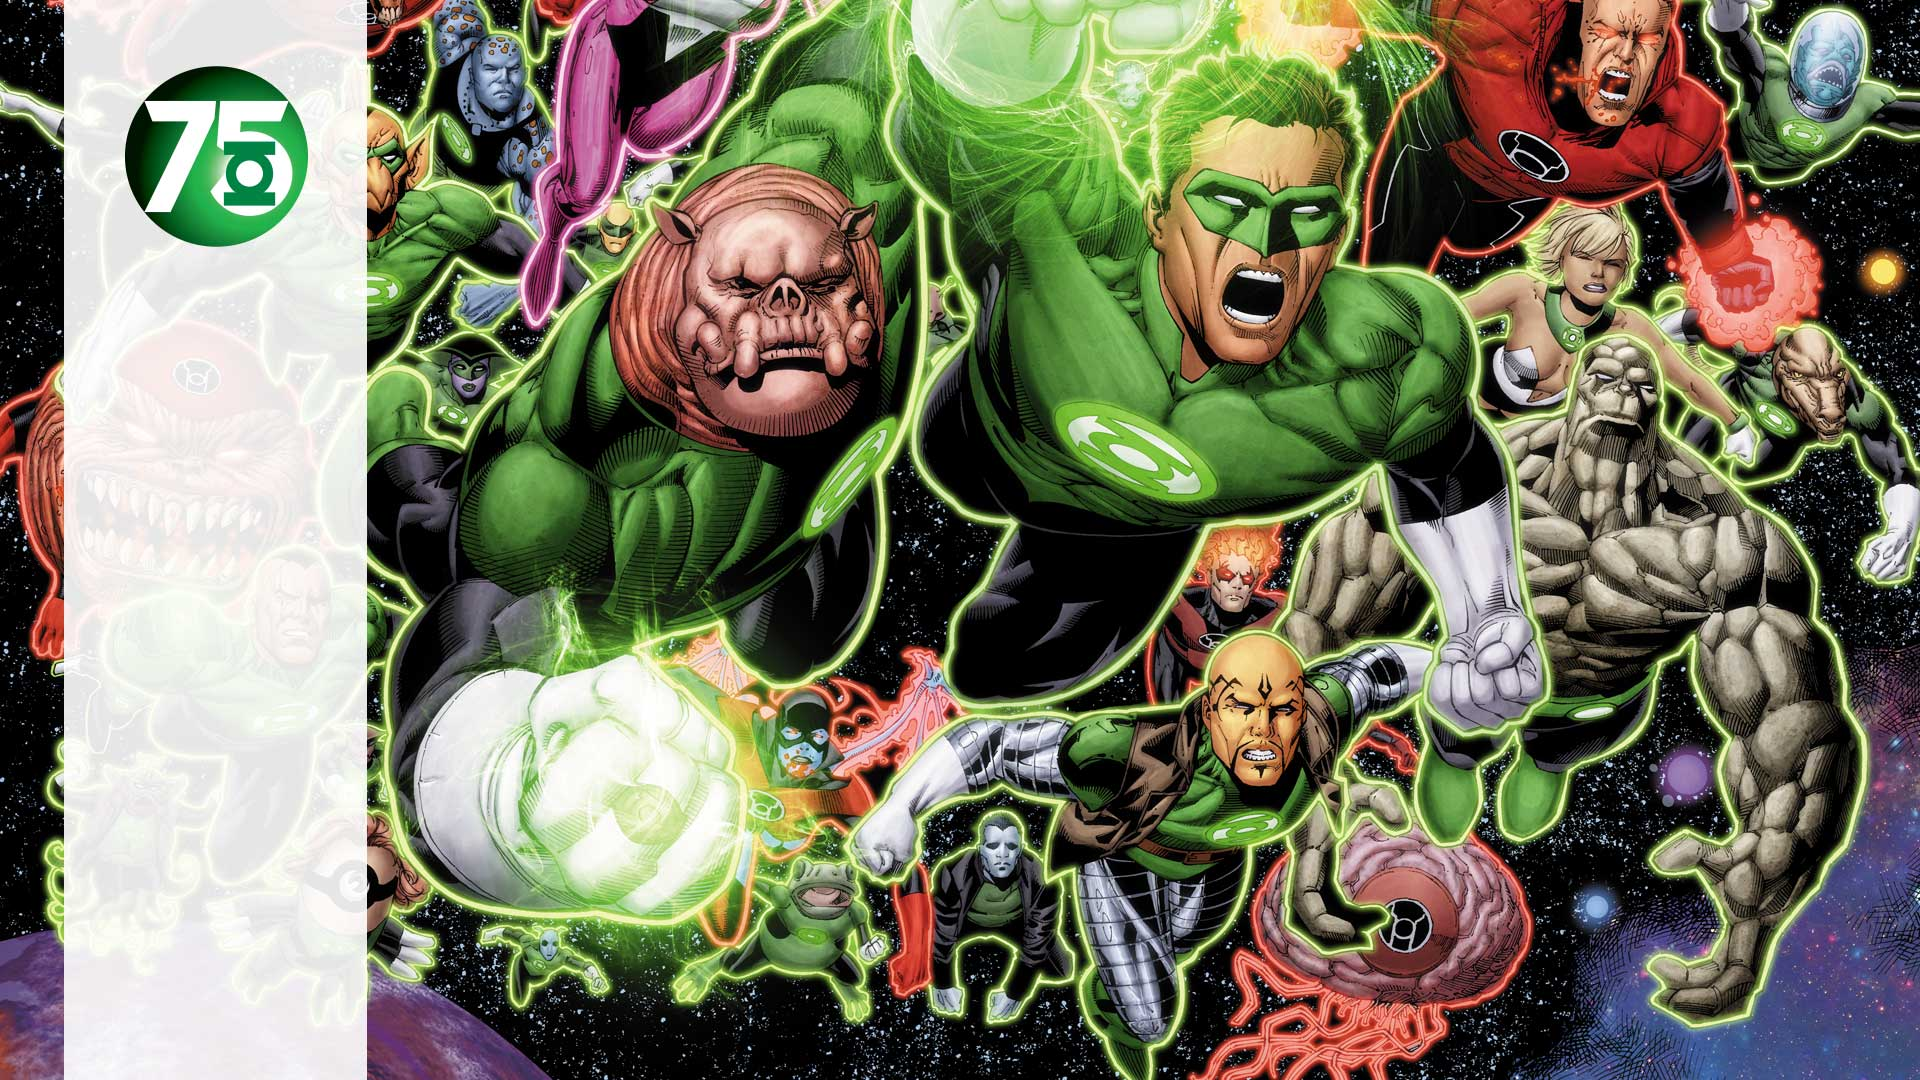 Par où commencer #1 - Green Lantern